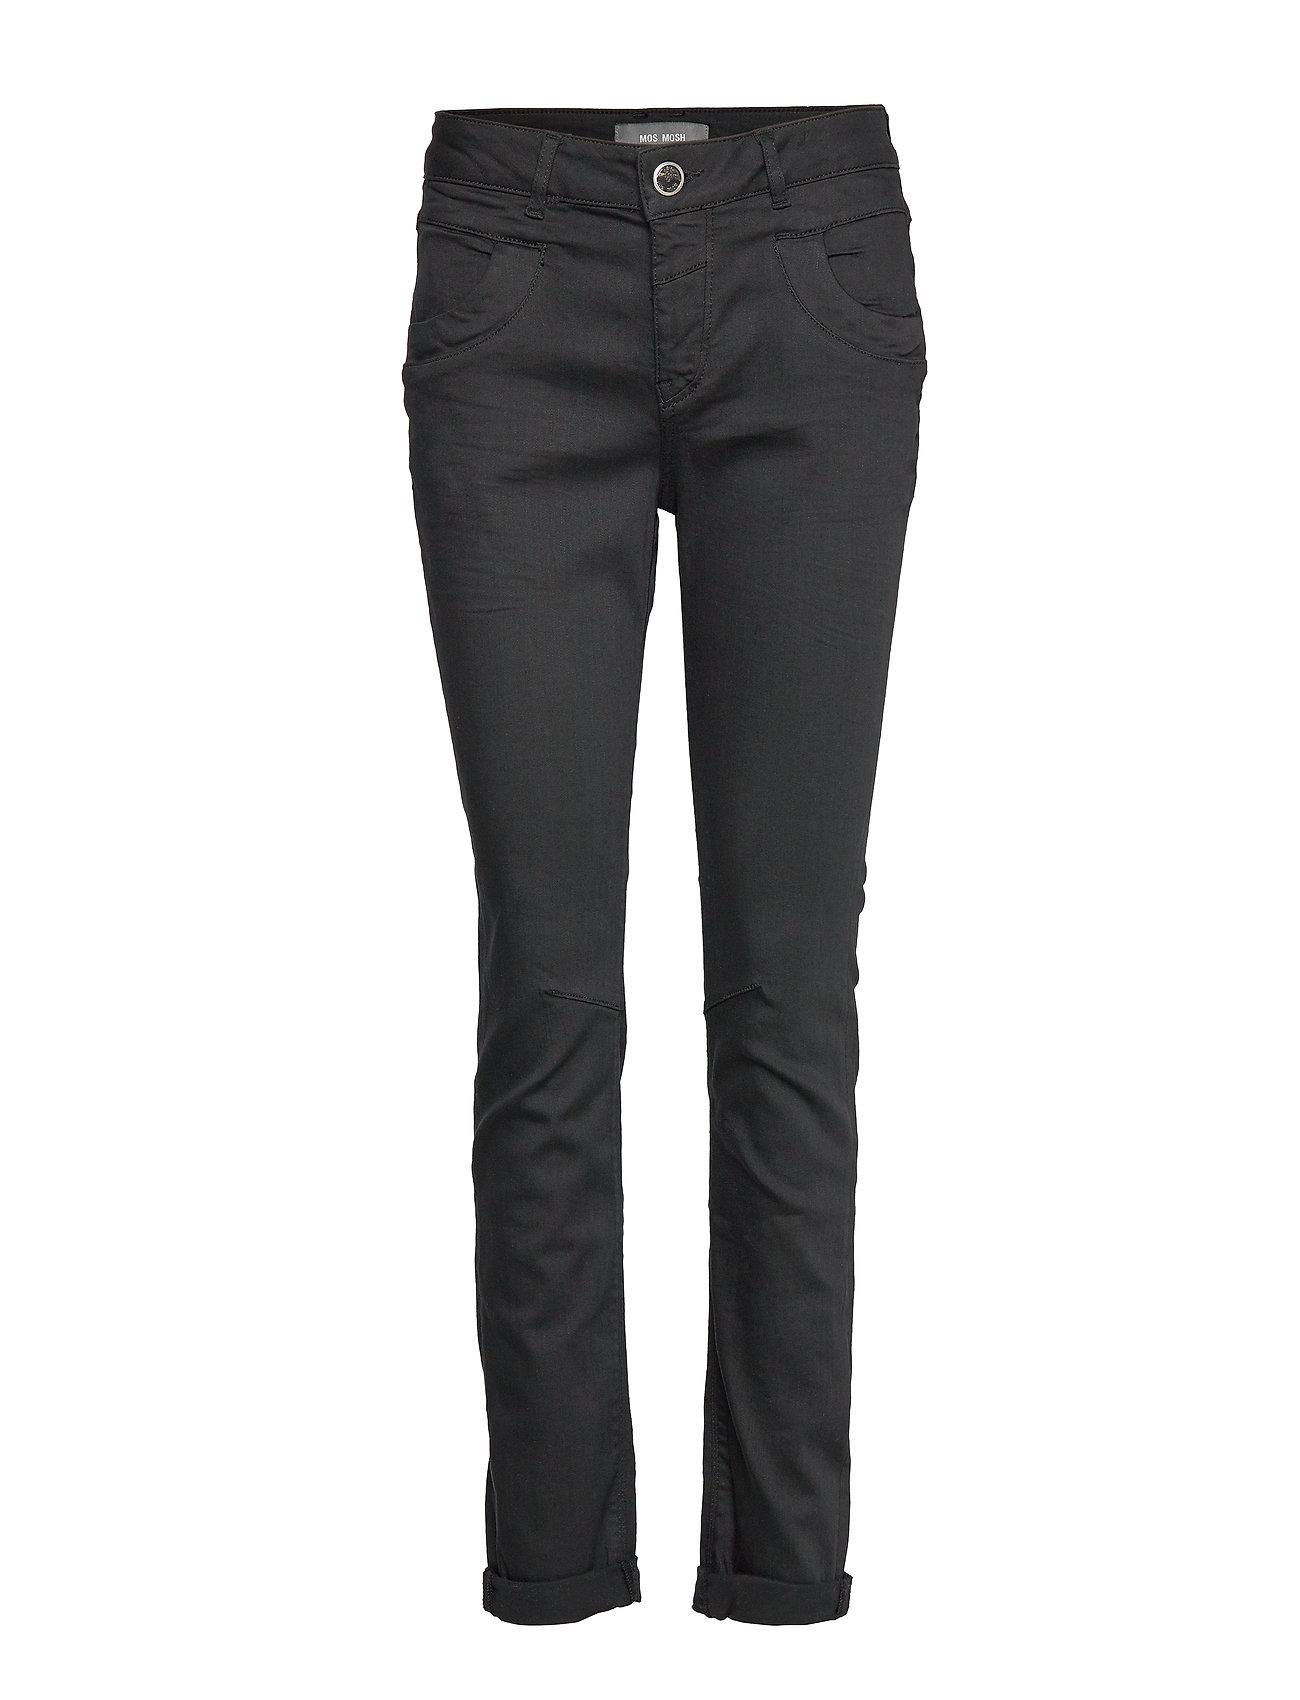 MOS MOSH Naomi Hybrid Jeans - BLACK DENIM